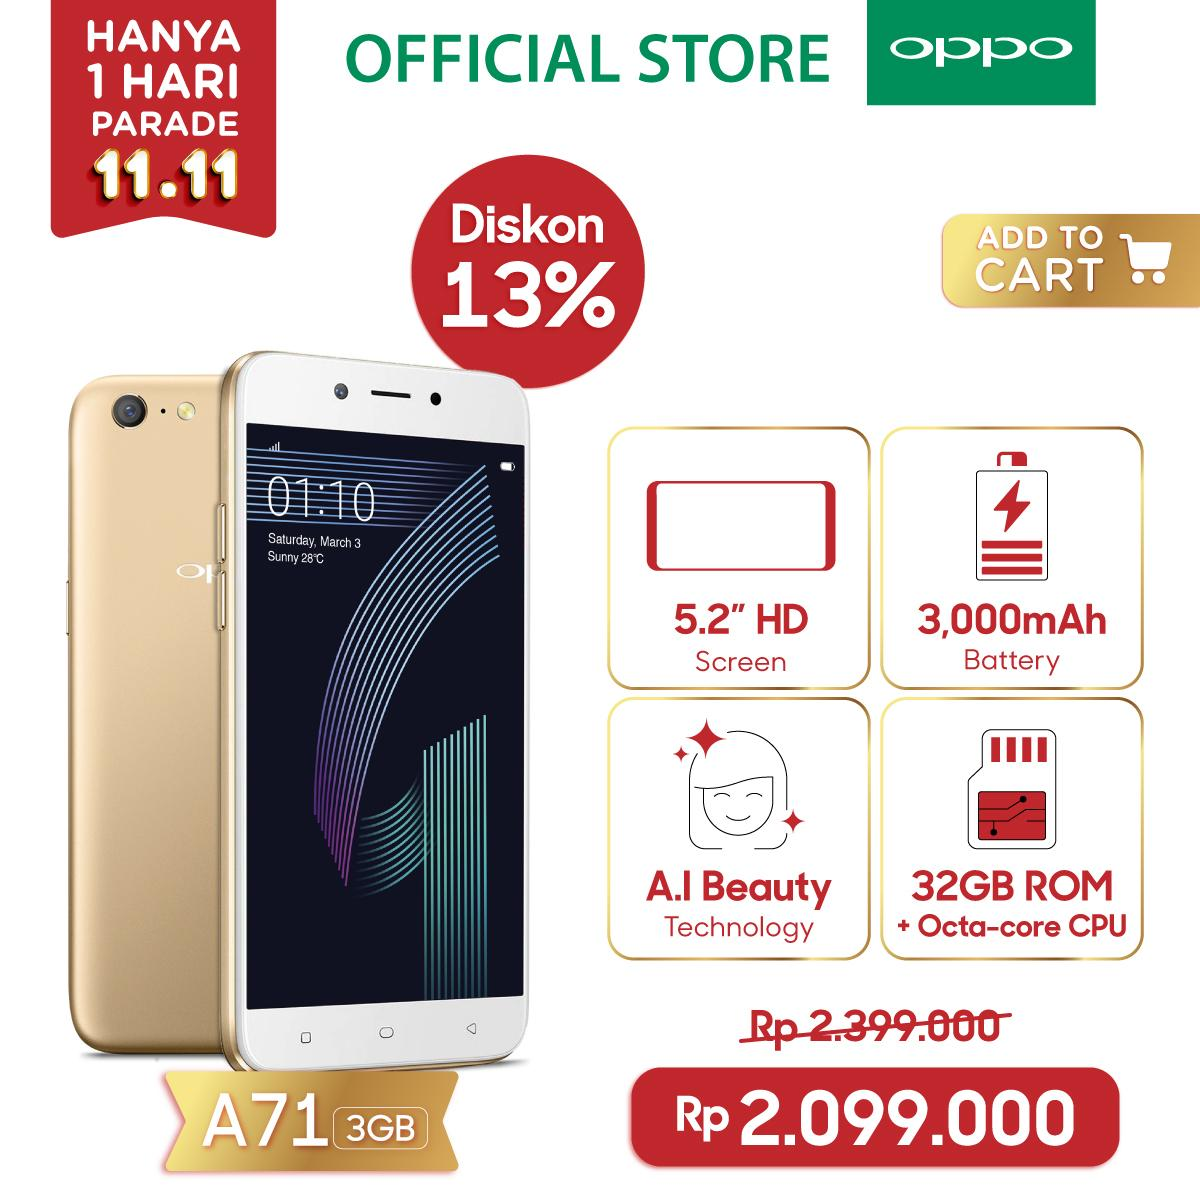 OPPO A71 SMARTPHONE 2018 3GB/32GB Gold , A.I Beauty Technology, Speedy Operation (COD, Garansi Resmi OPPO, Cicilan tanpa kartu kredit, Cicilan 0%, Gratis Ongkir)